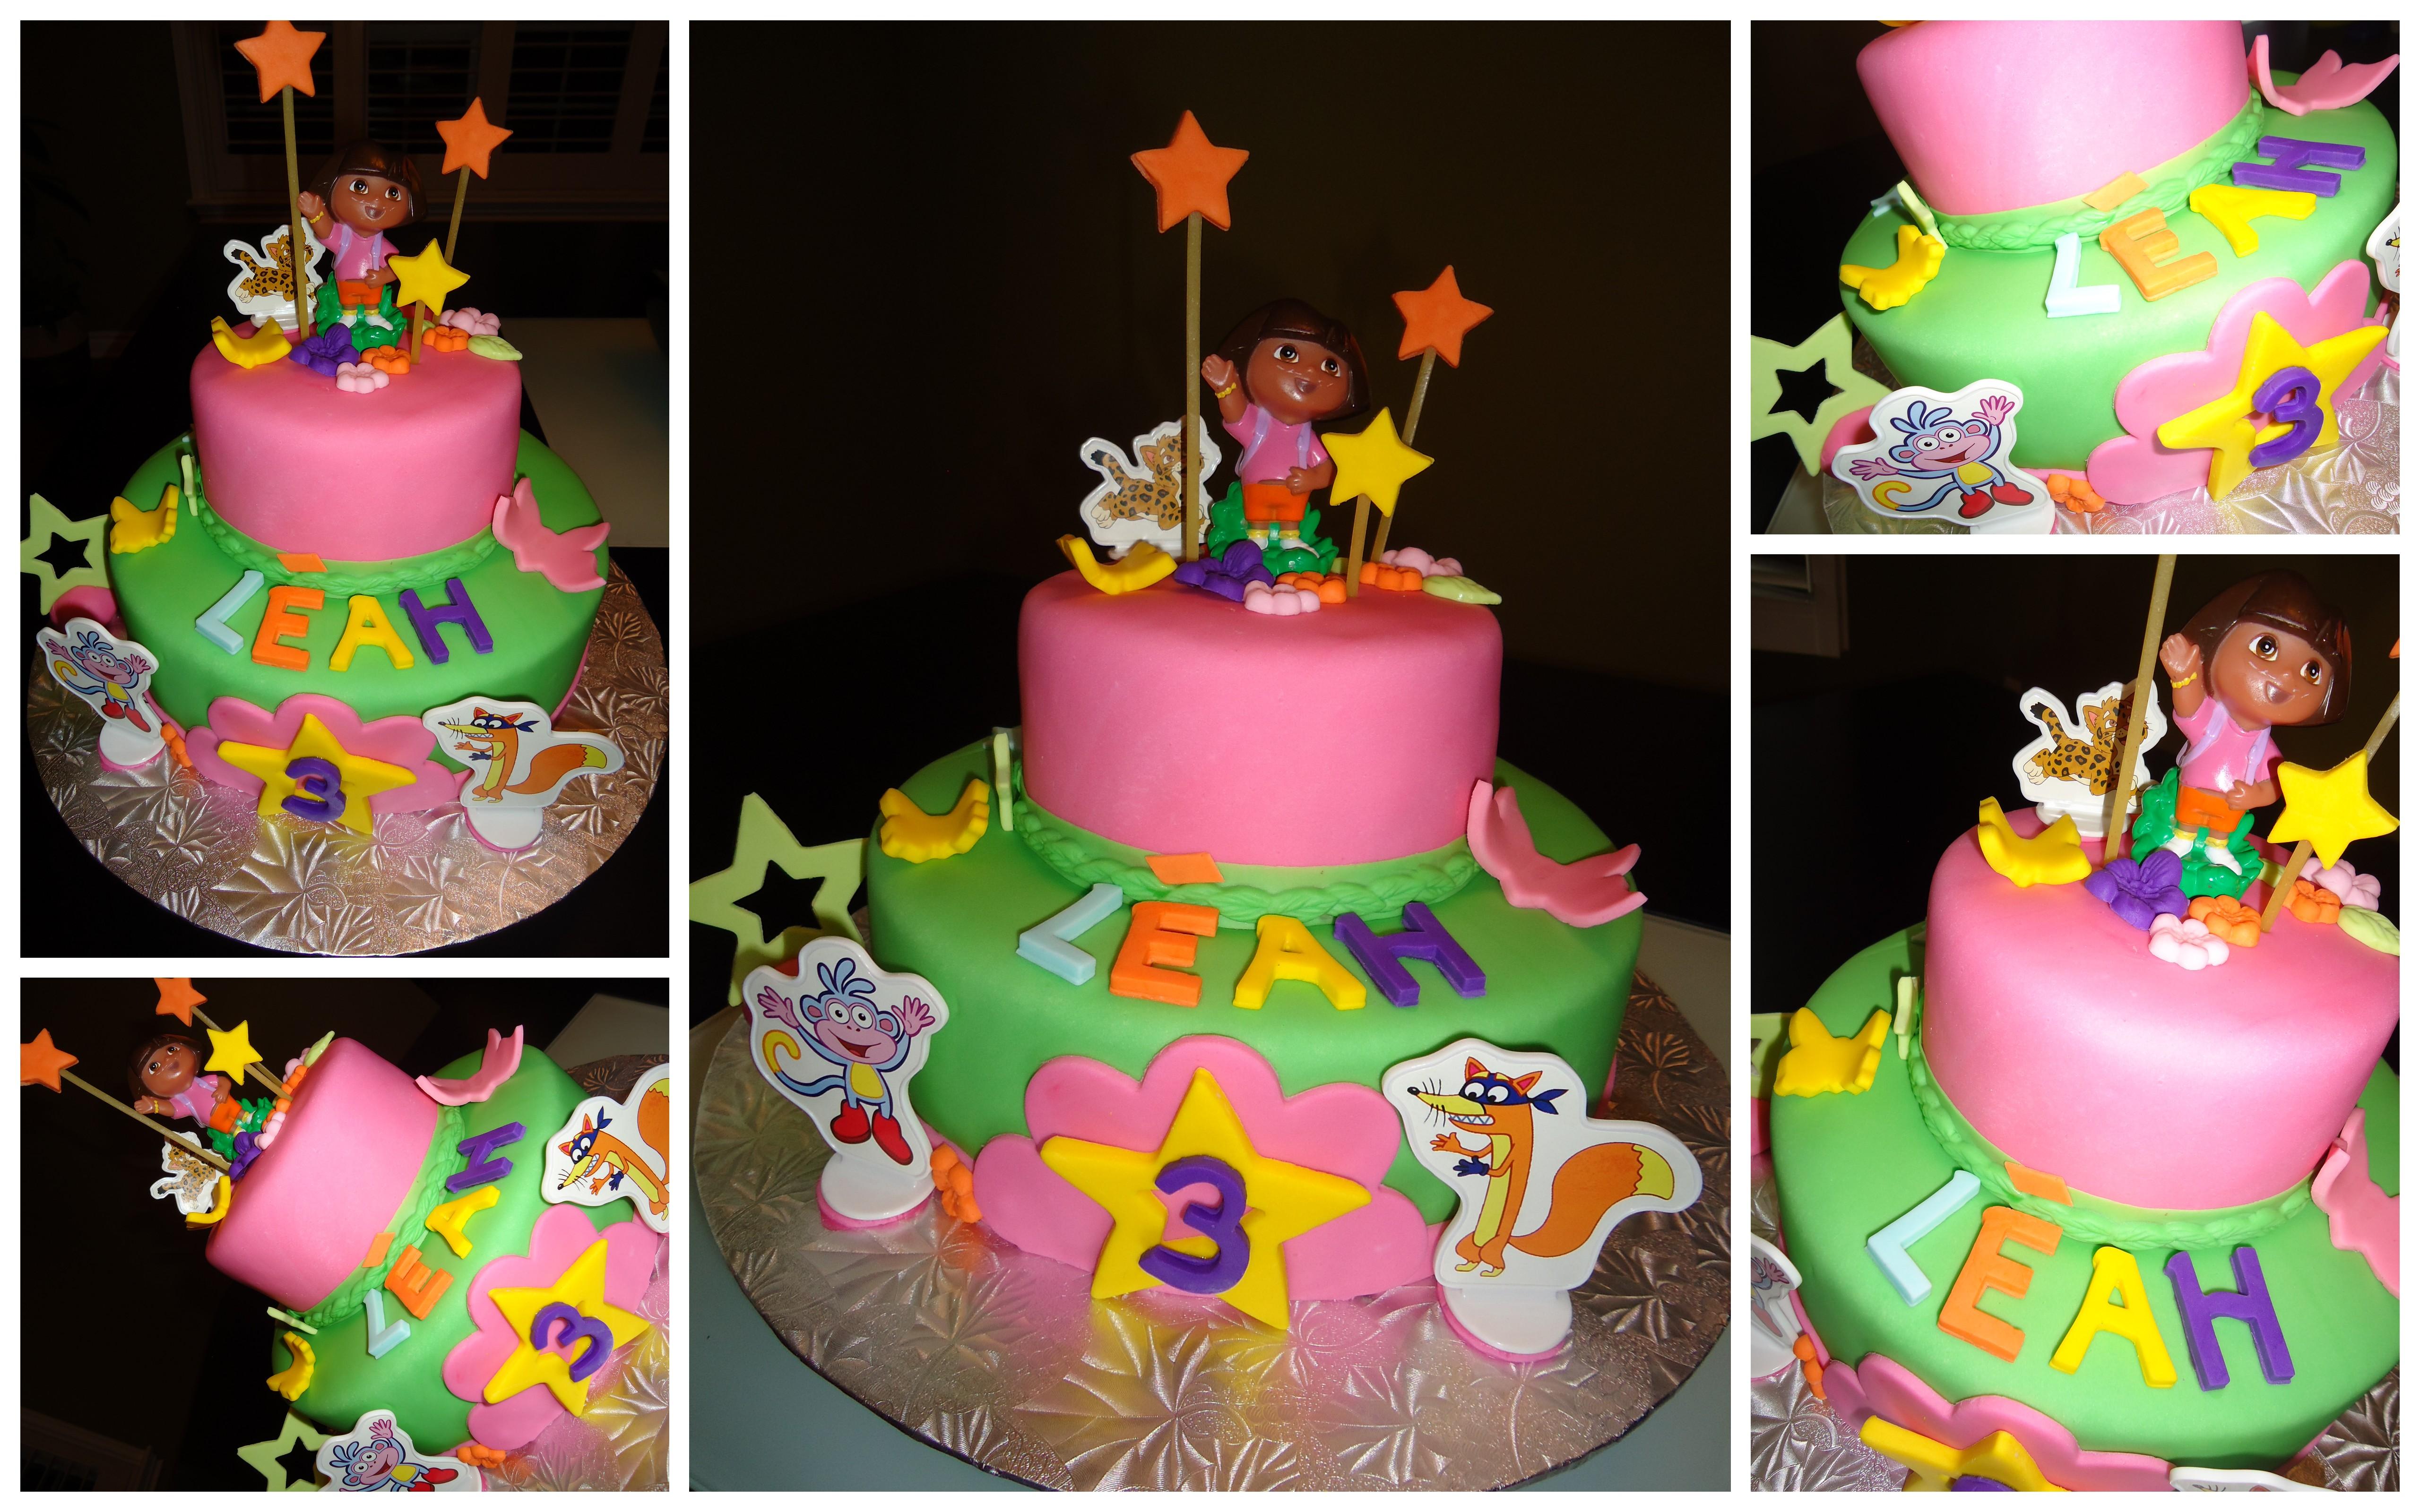 10 Dora 2 Birthday Cakes Photo Dora Birthday Party Cakes Dora The